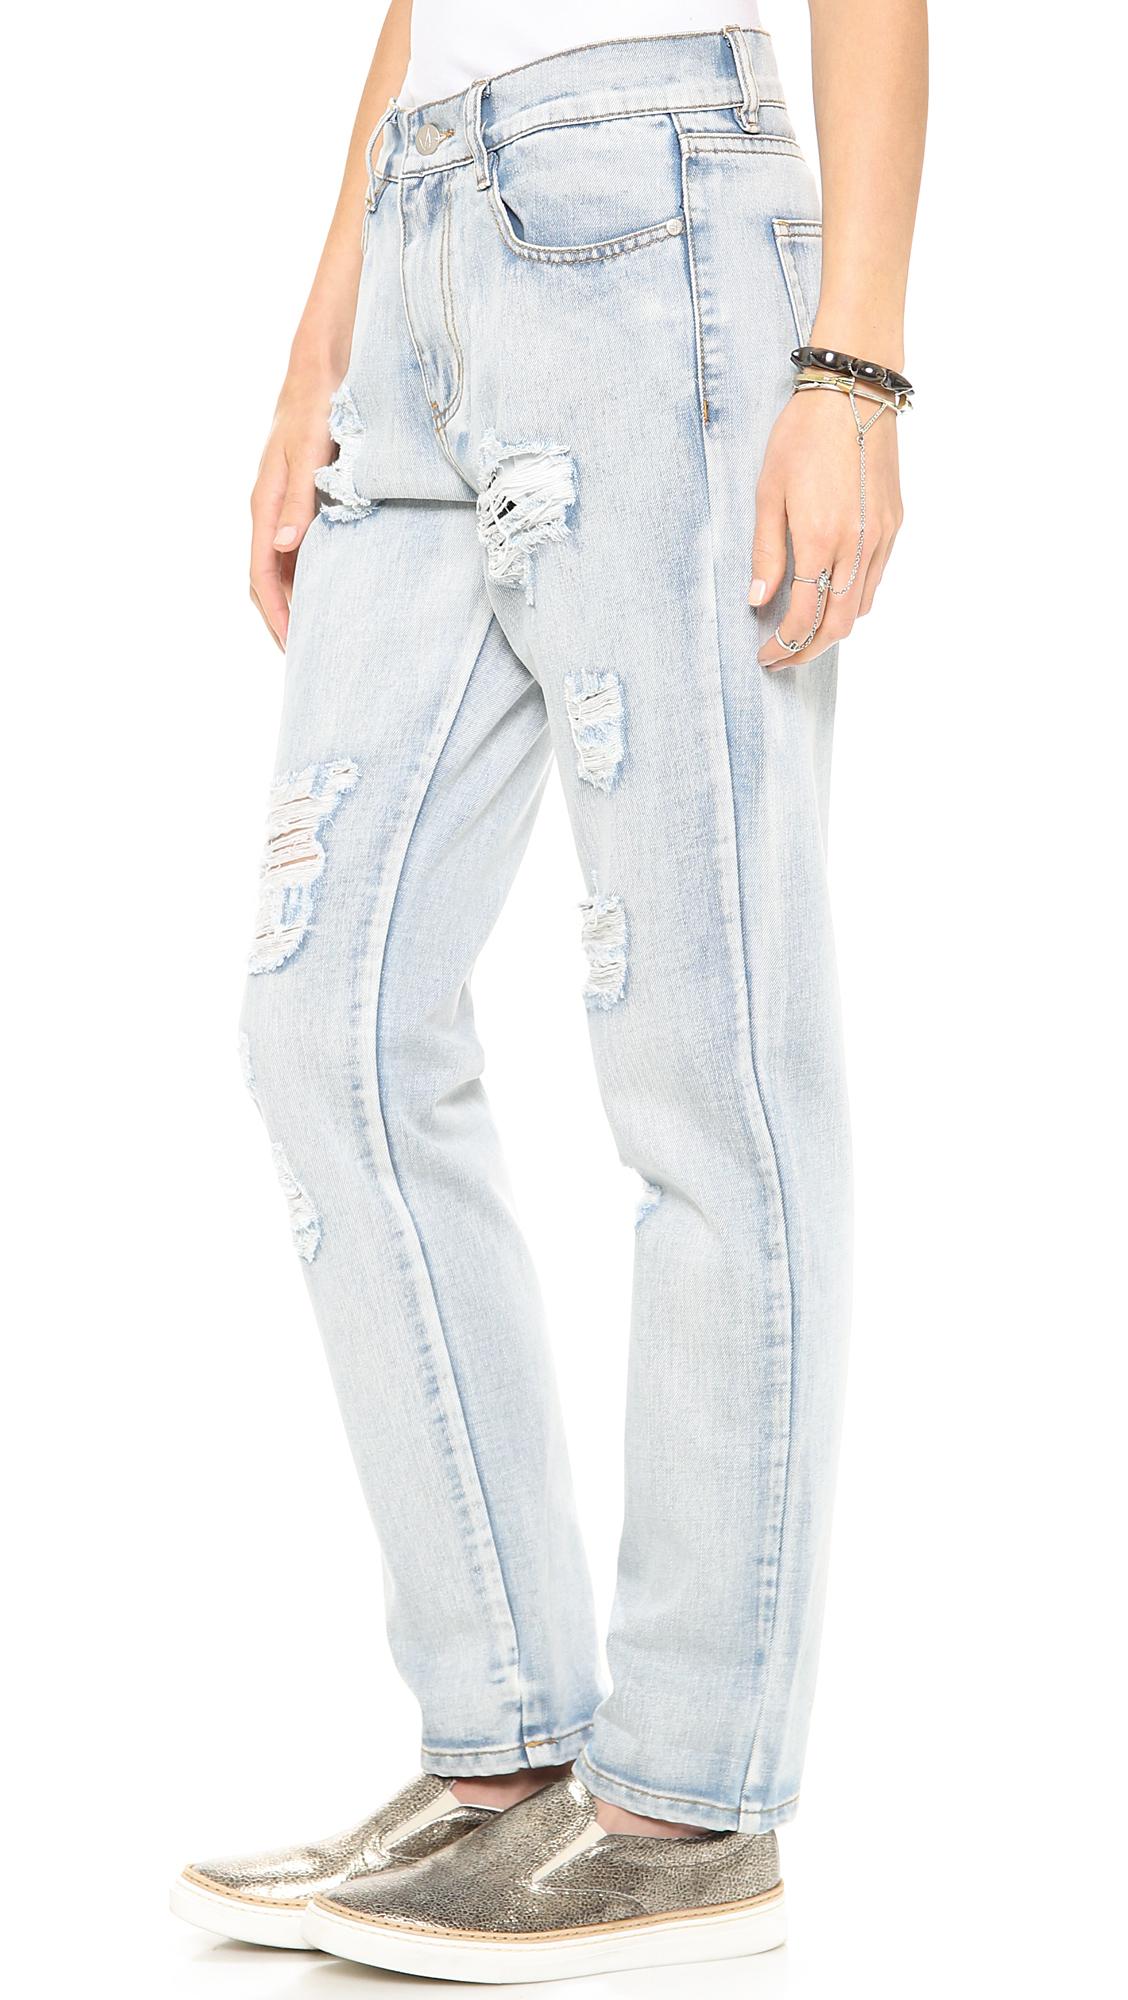 Minkpink Womens Instinct Blues Boyfriend Jeans Minkpink Sale Largest Supplier vyOuaG